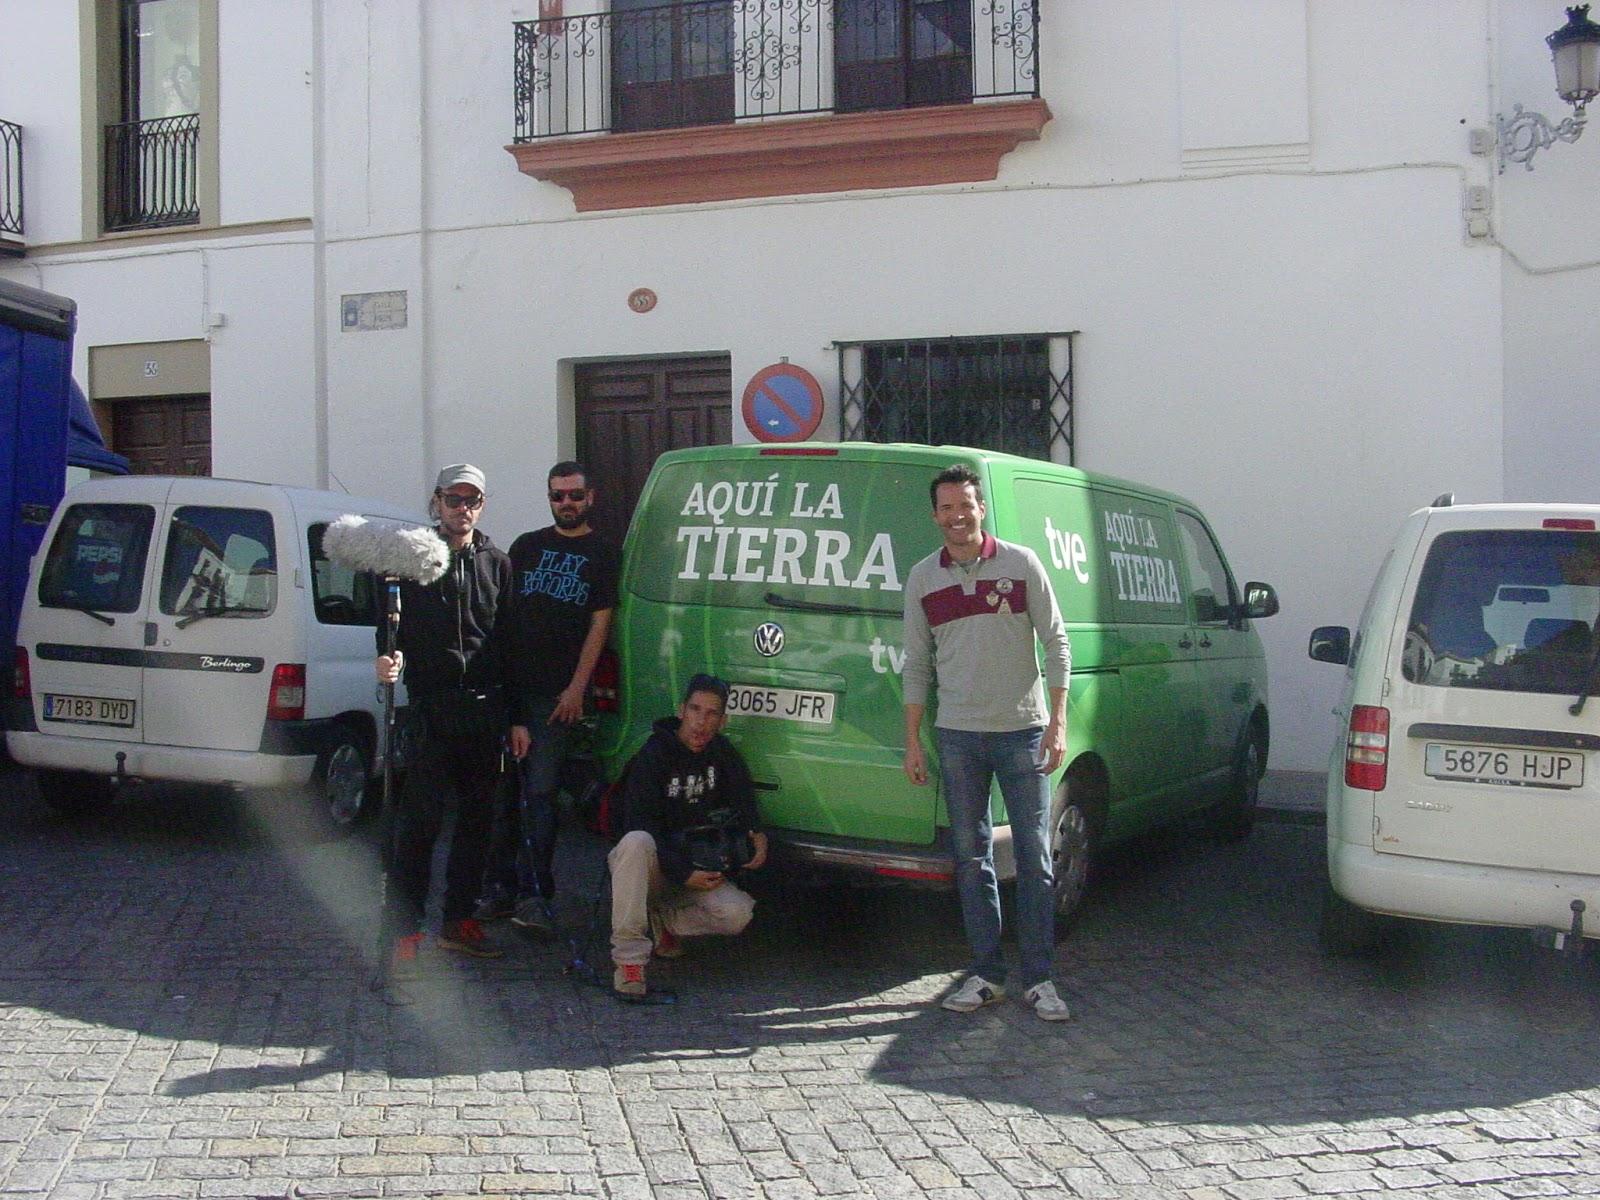 Oficina de turismo de carmona noviembre 2015 for Oficina turismo carmona